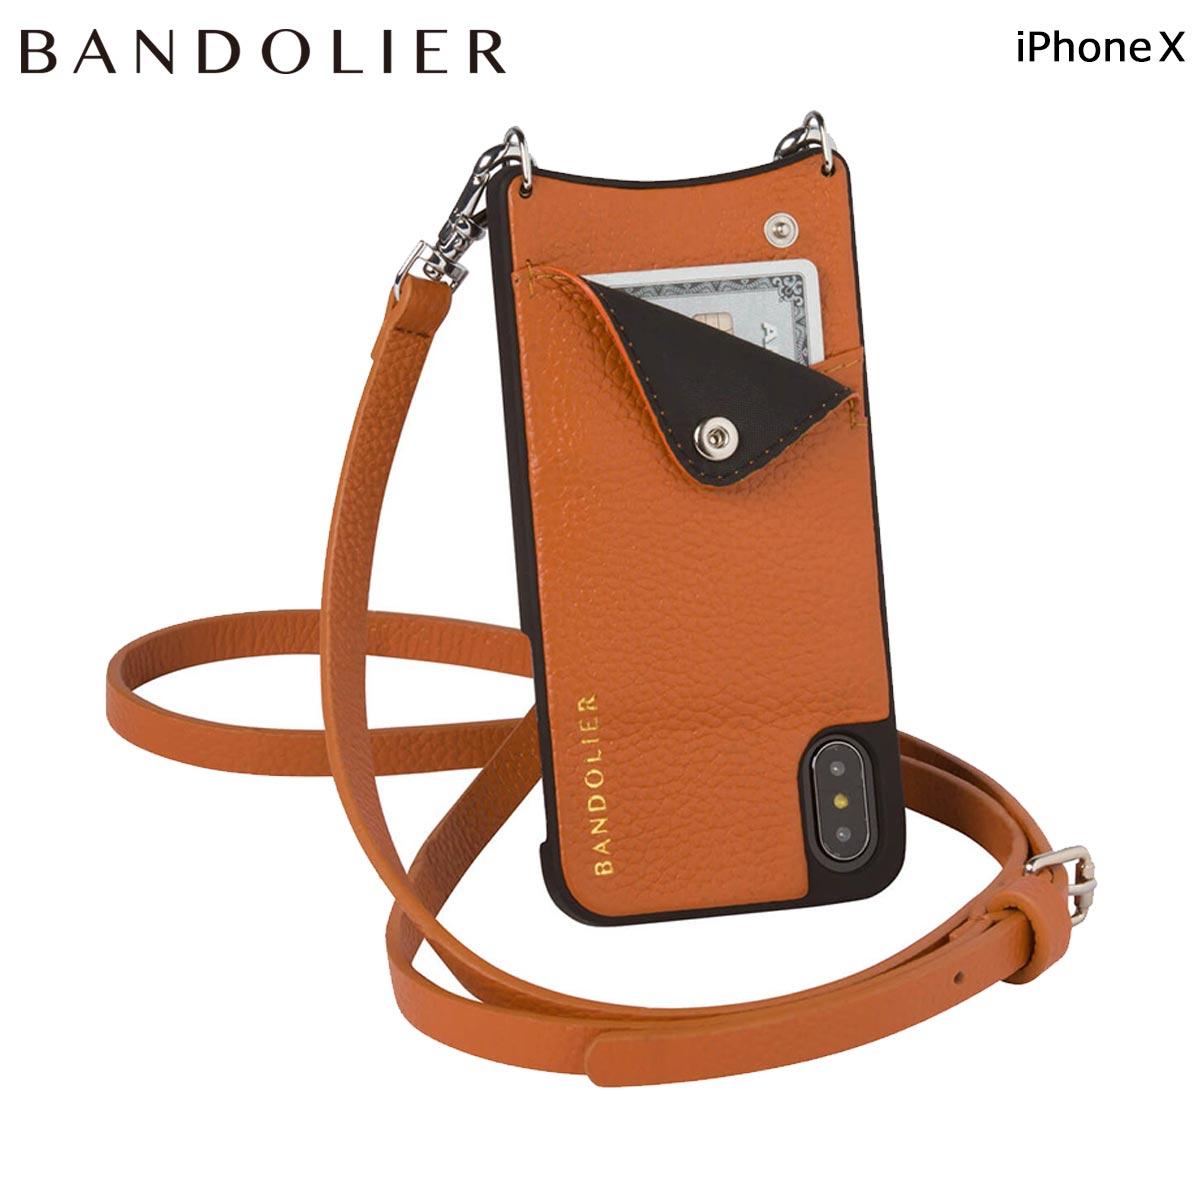 BANDOLIER バンドリヤー iPhoneX ケース スマホ アイフォン EMMA COGNAC レザー メンズ レディース [6/1 新入荷] 【決算セール 返品不可】